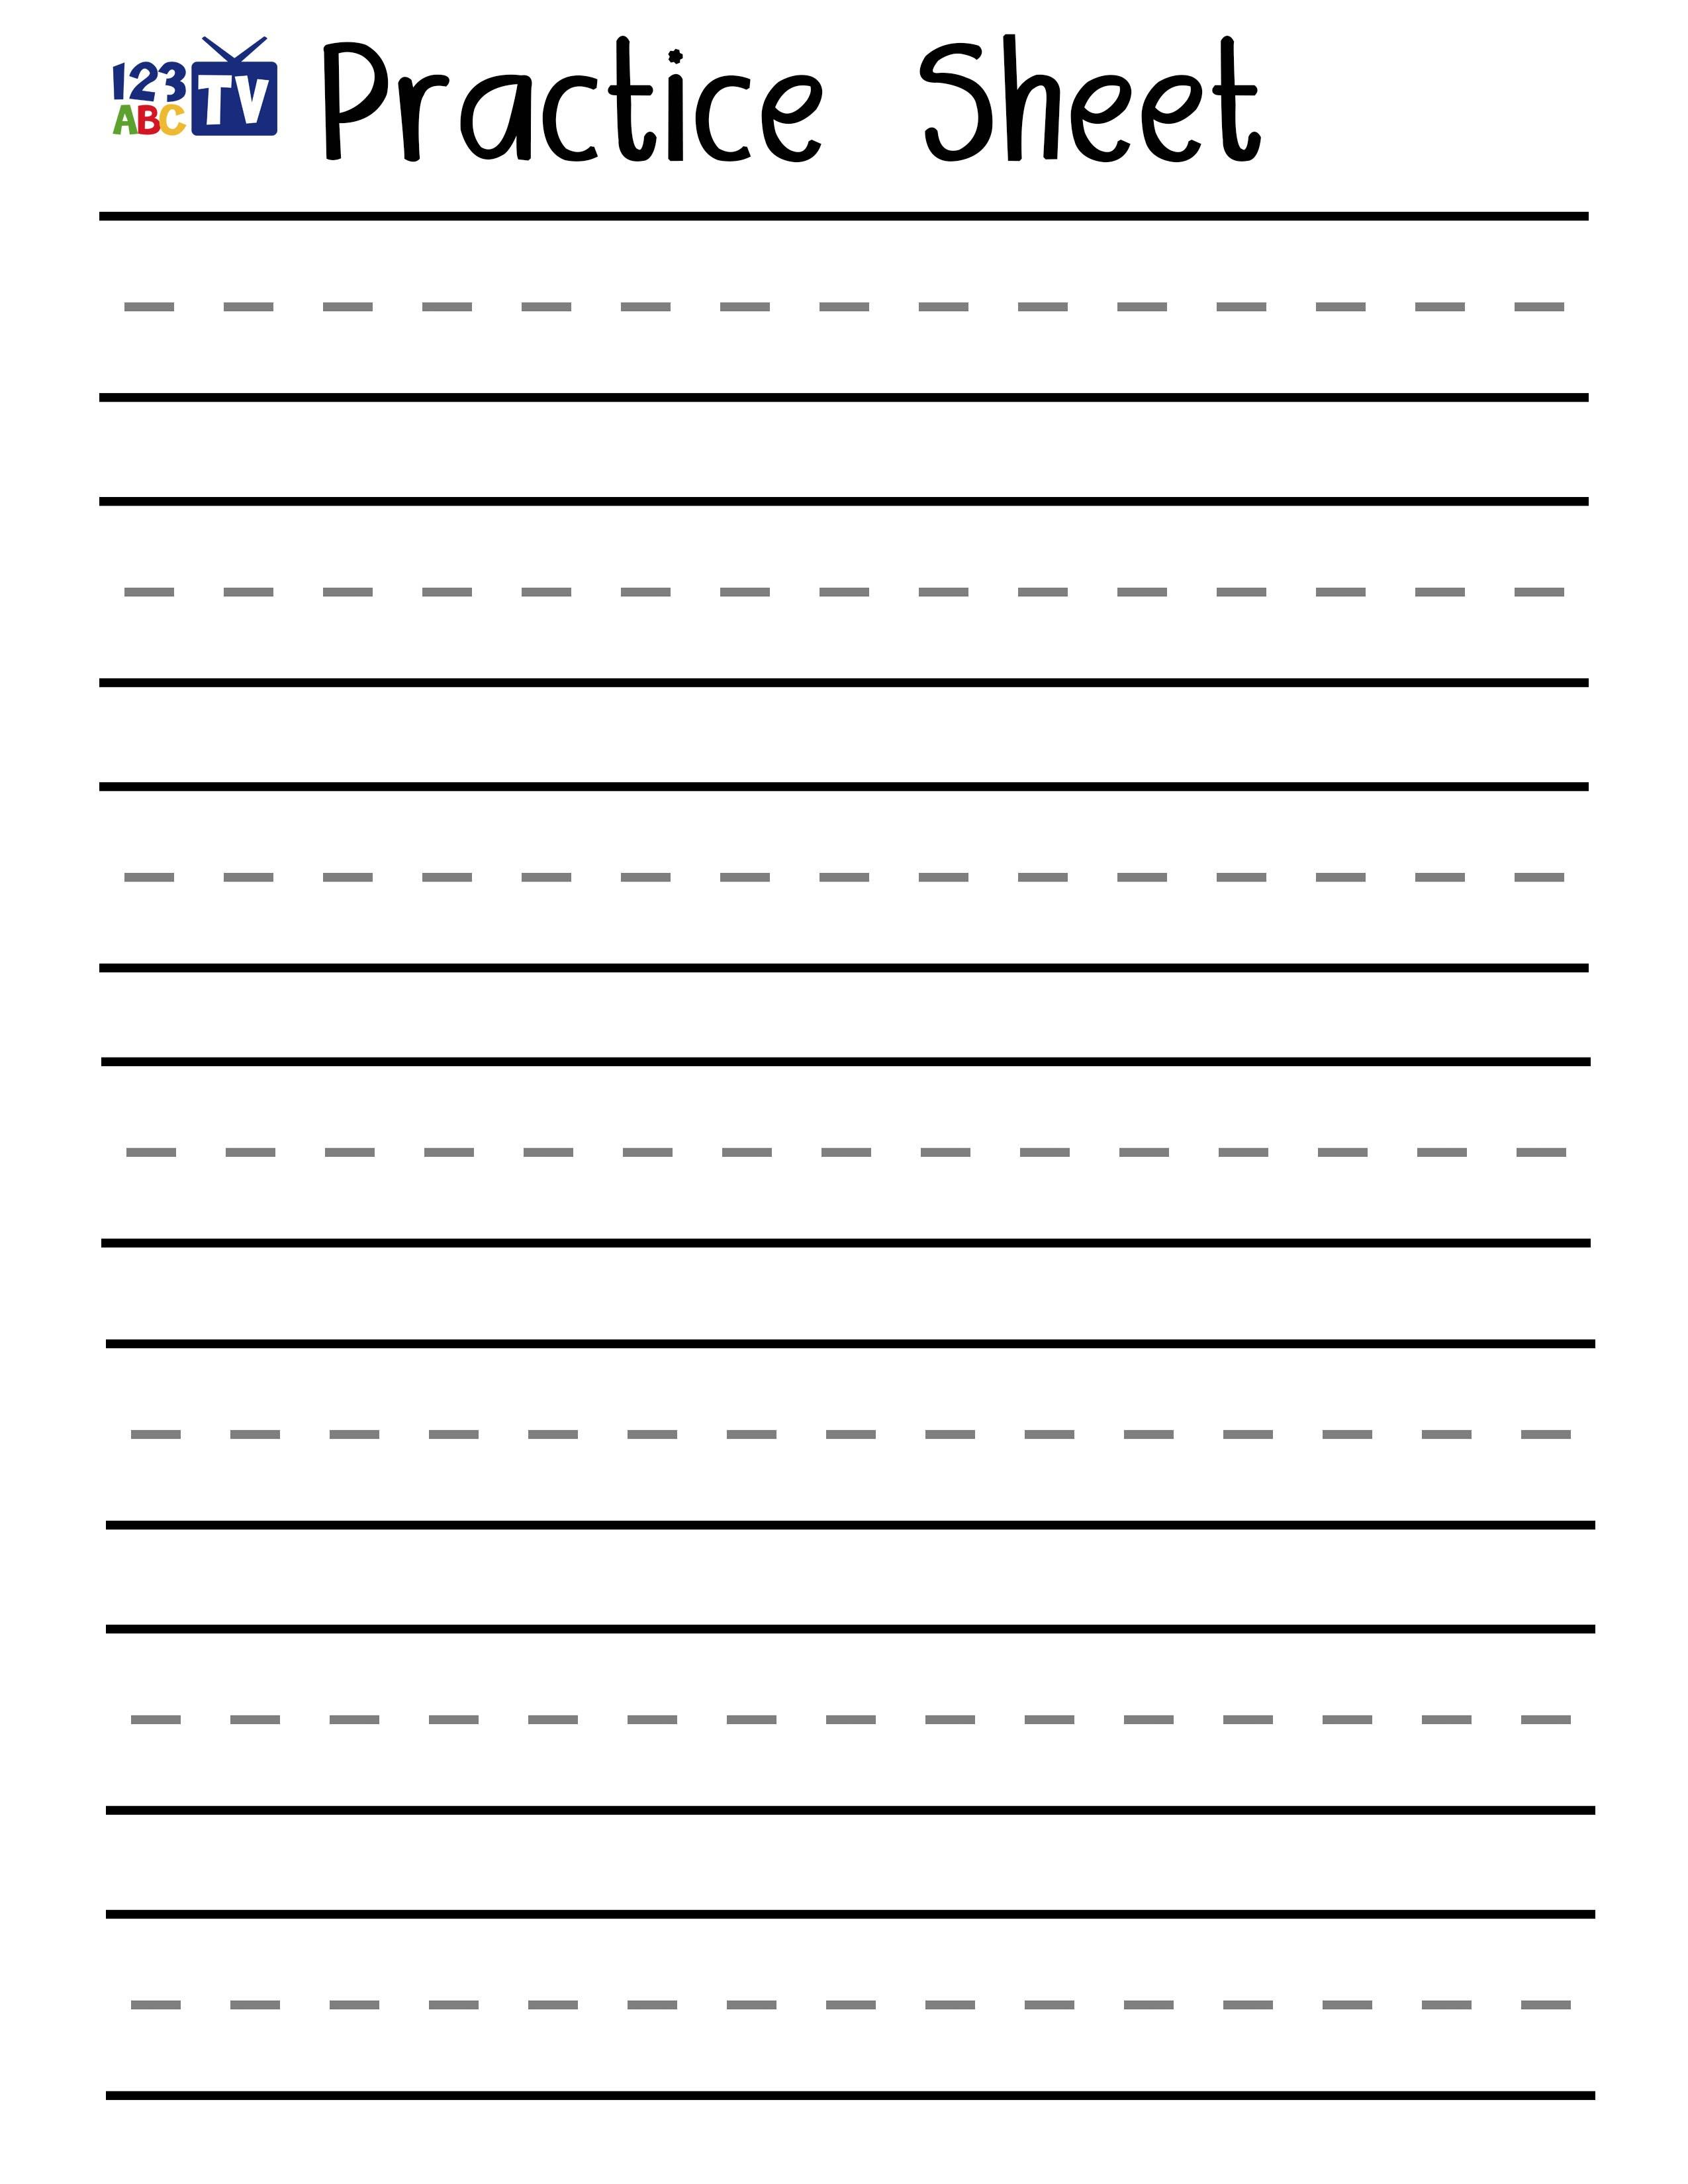 Blank Handwriting Worksheets Pdf Awesome Print Handwriting - Blank Handwriting Worksheets Printable Free